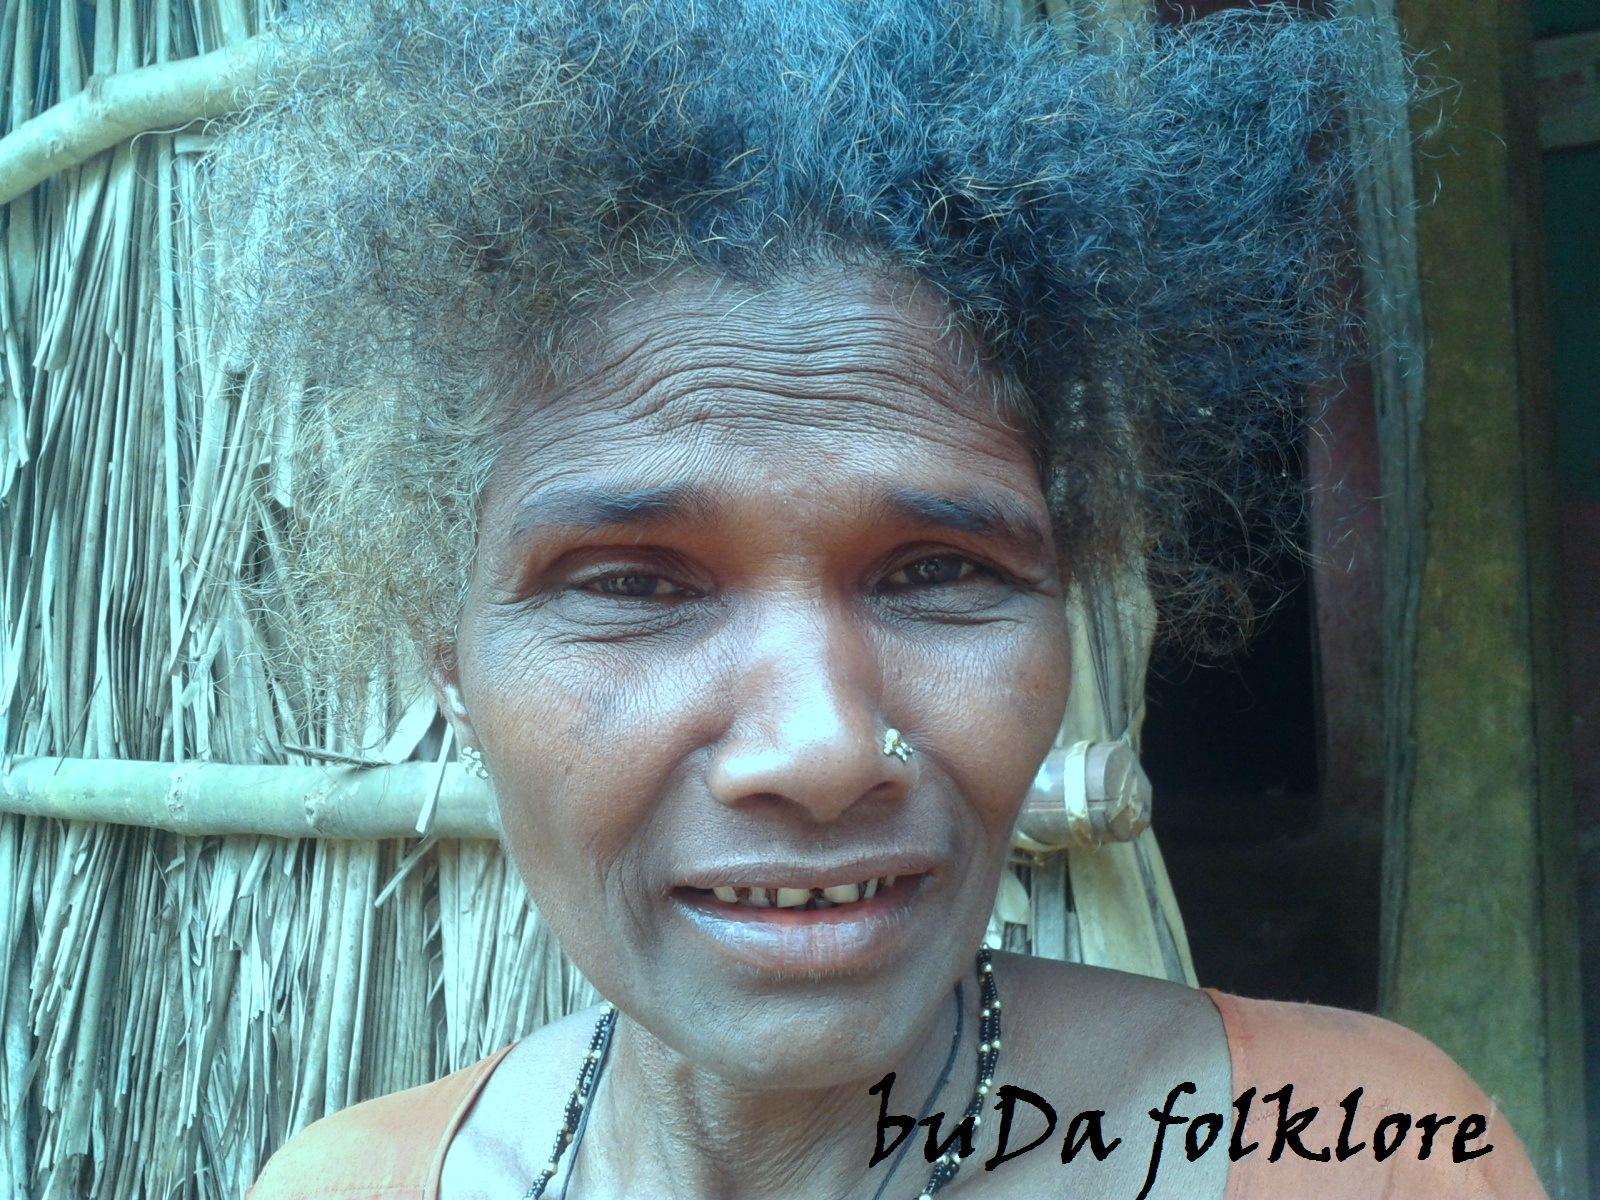 my village in kannada Contextual translation of essay on my village into kannada human translations  with examples: nanna prethiya amma, ಪೋಷಕರು ಪ್ರಬಂಧ, nana school,.